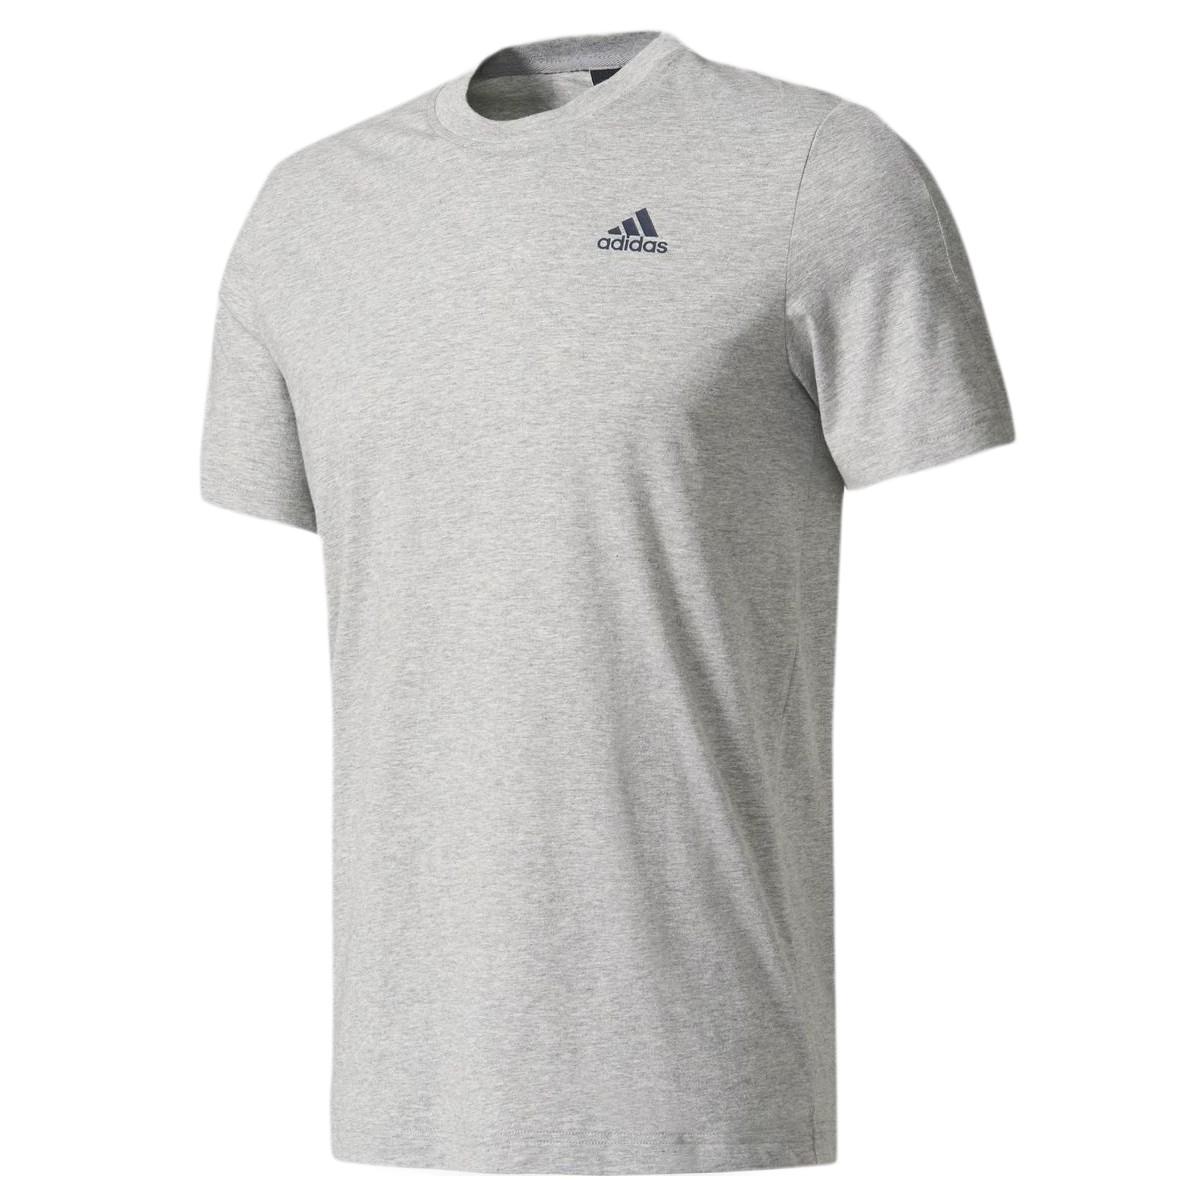 531d04565a409 Camiseta Adidas Mc Essentials Base Tee